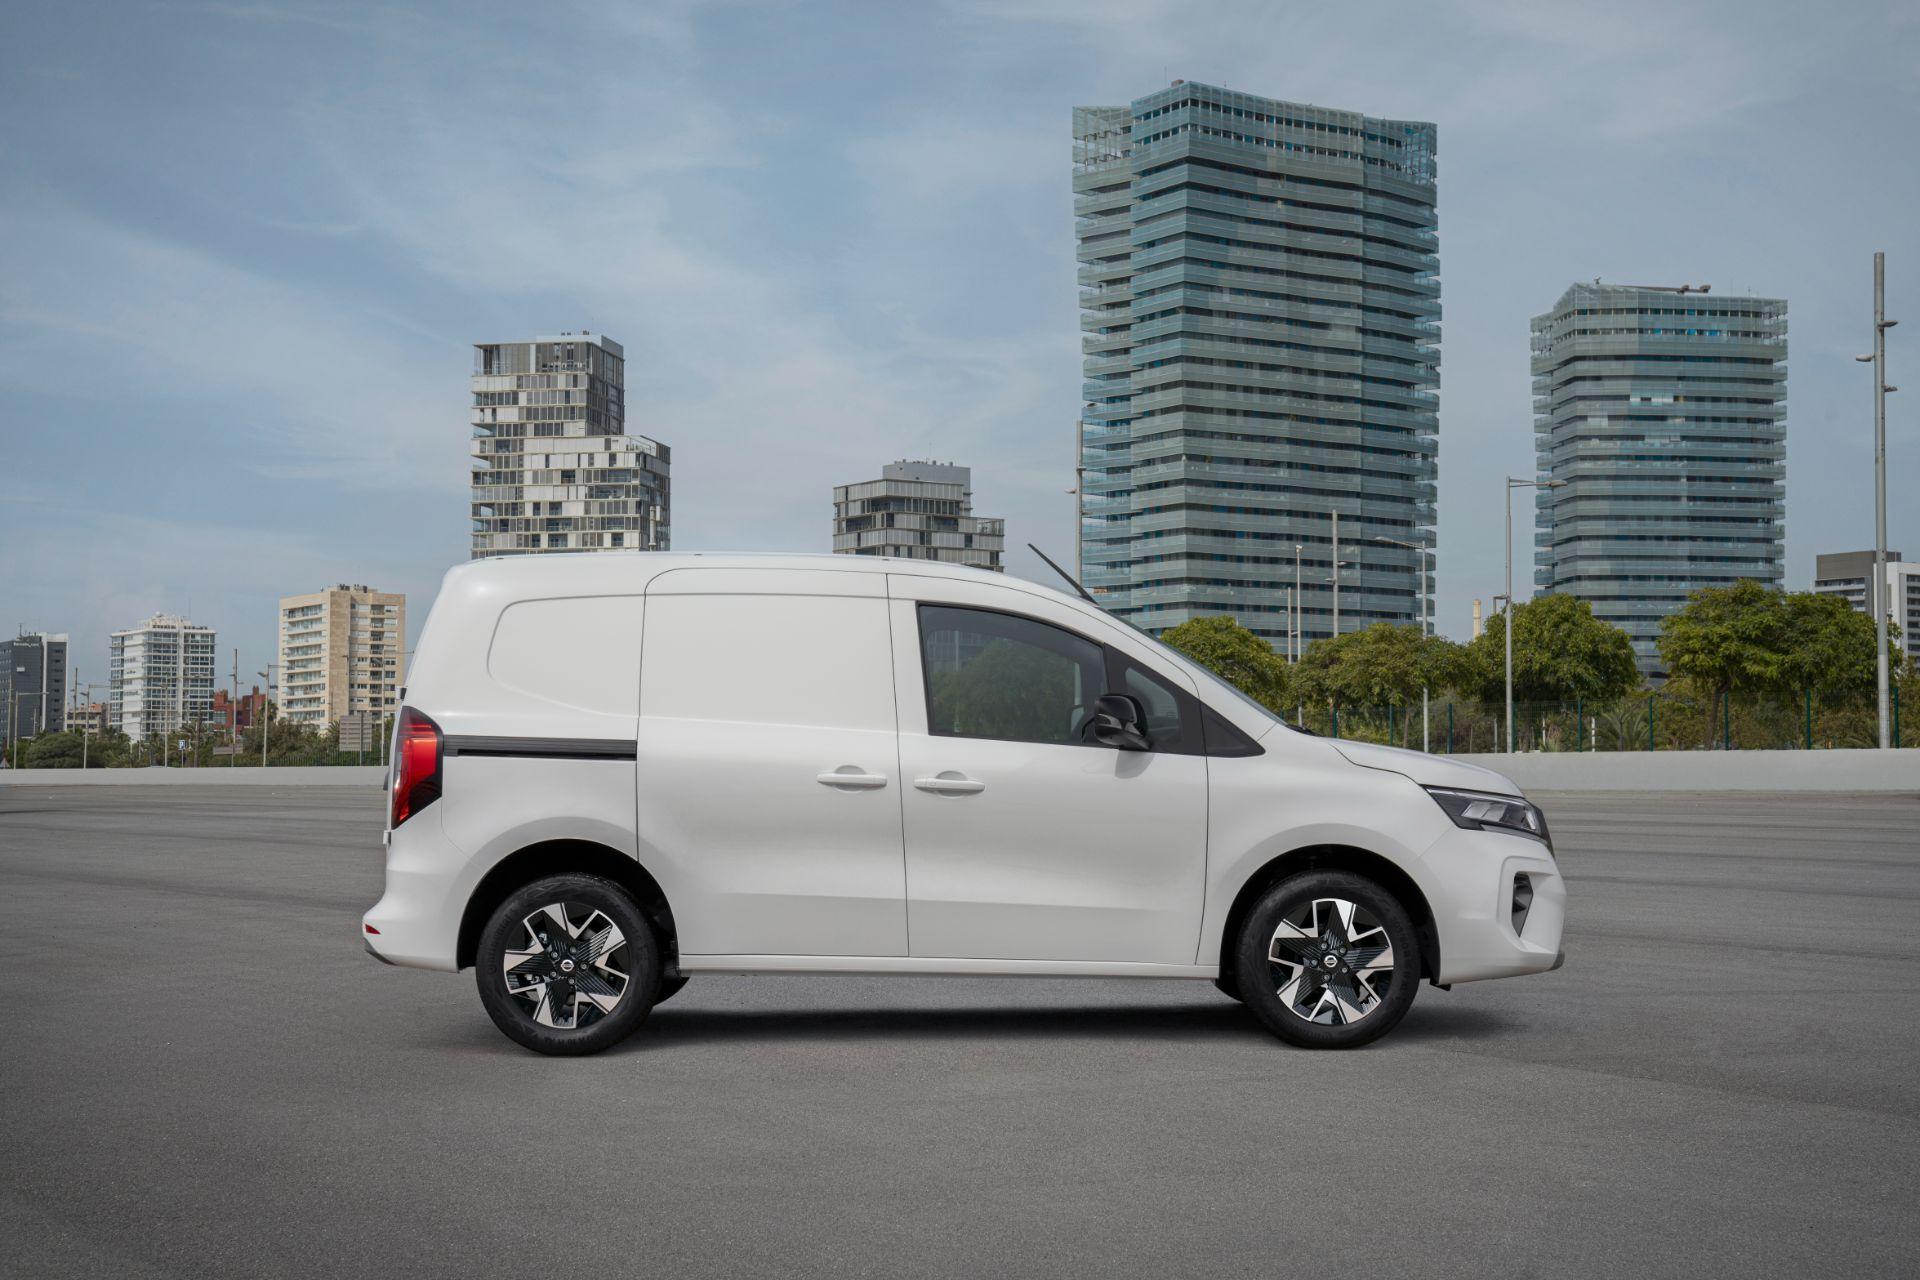 2022-Nissan-Townstar-EV-van-dynamic-6